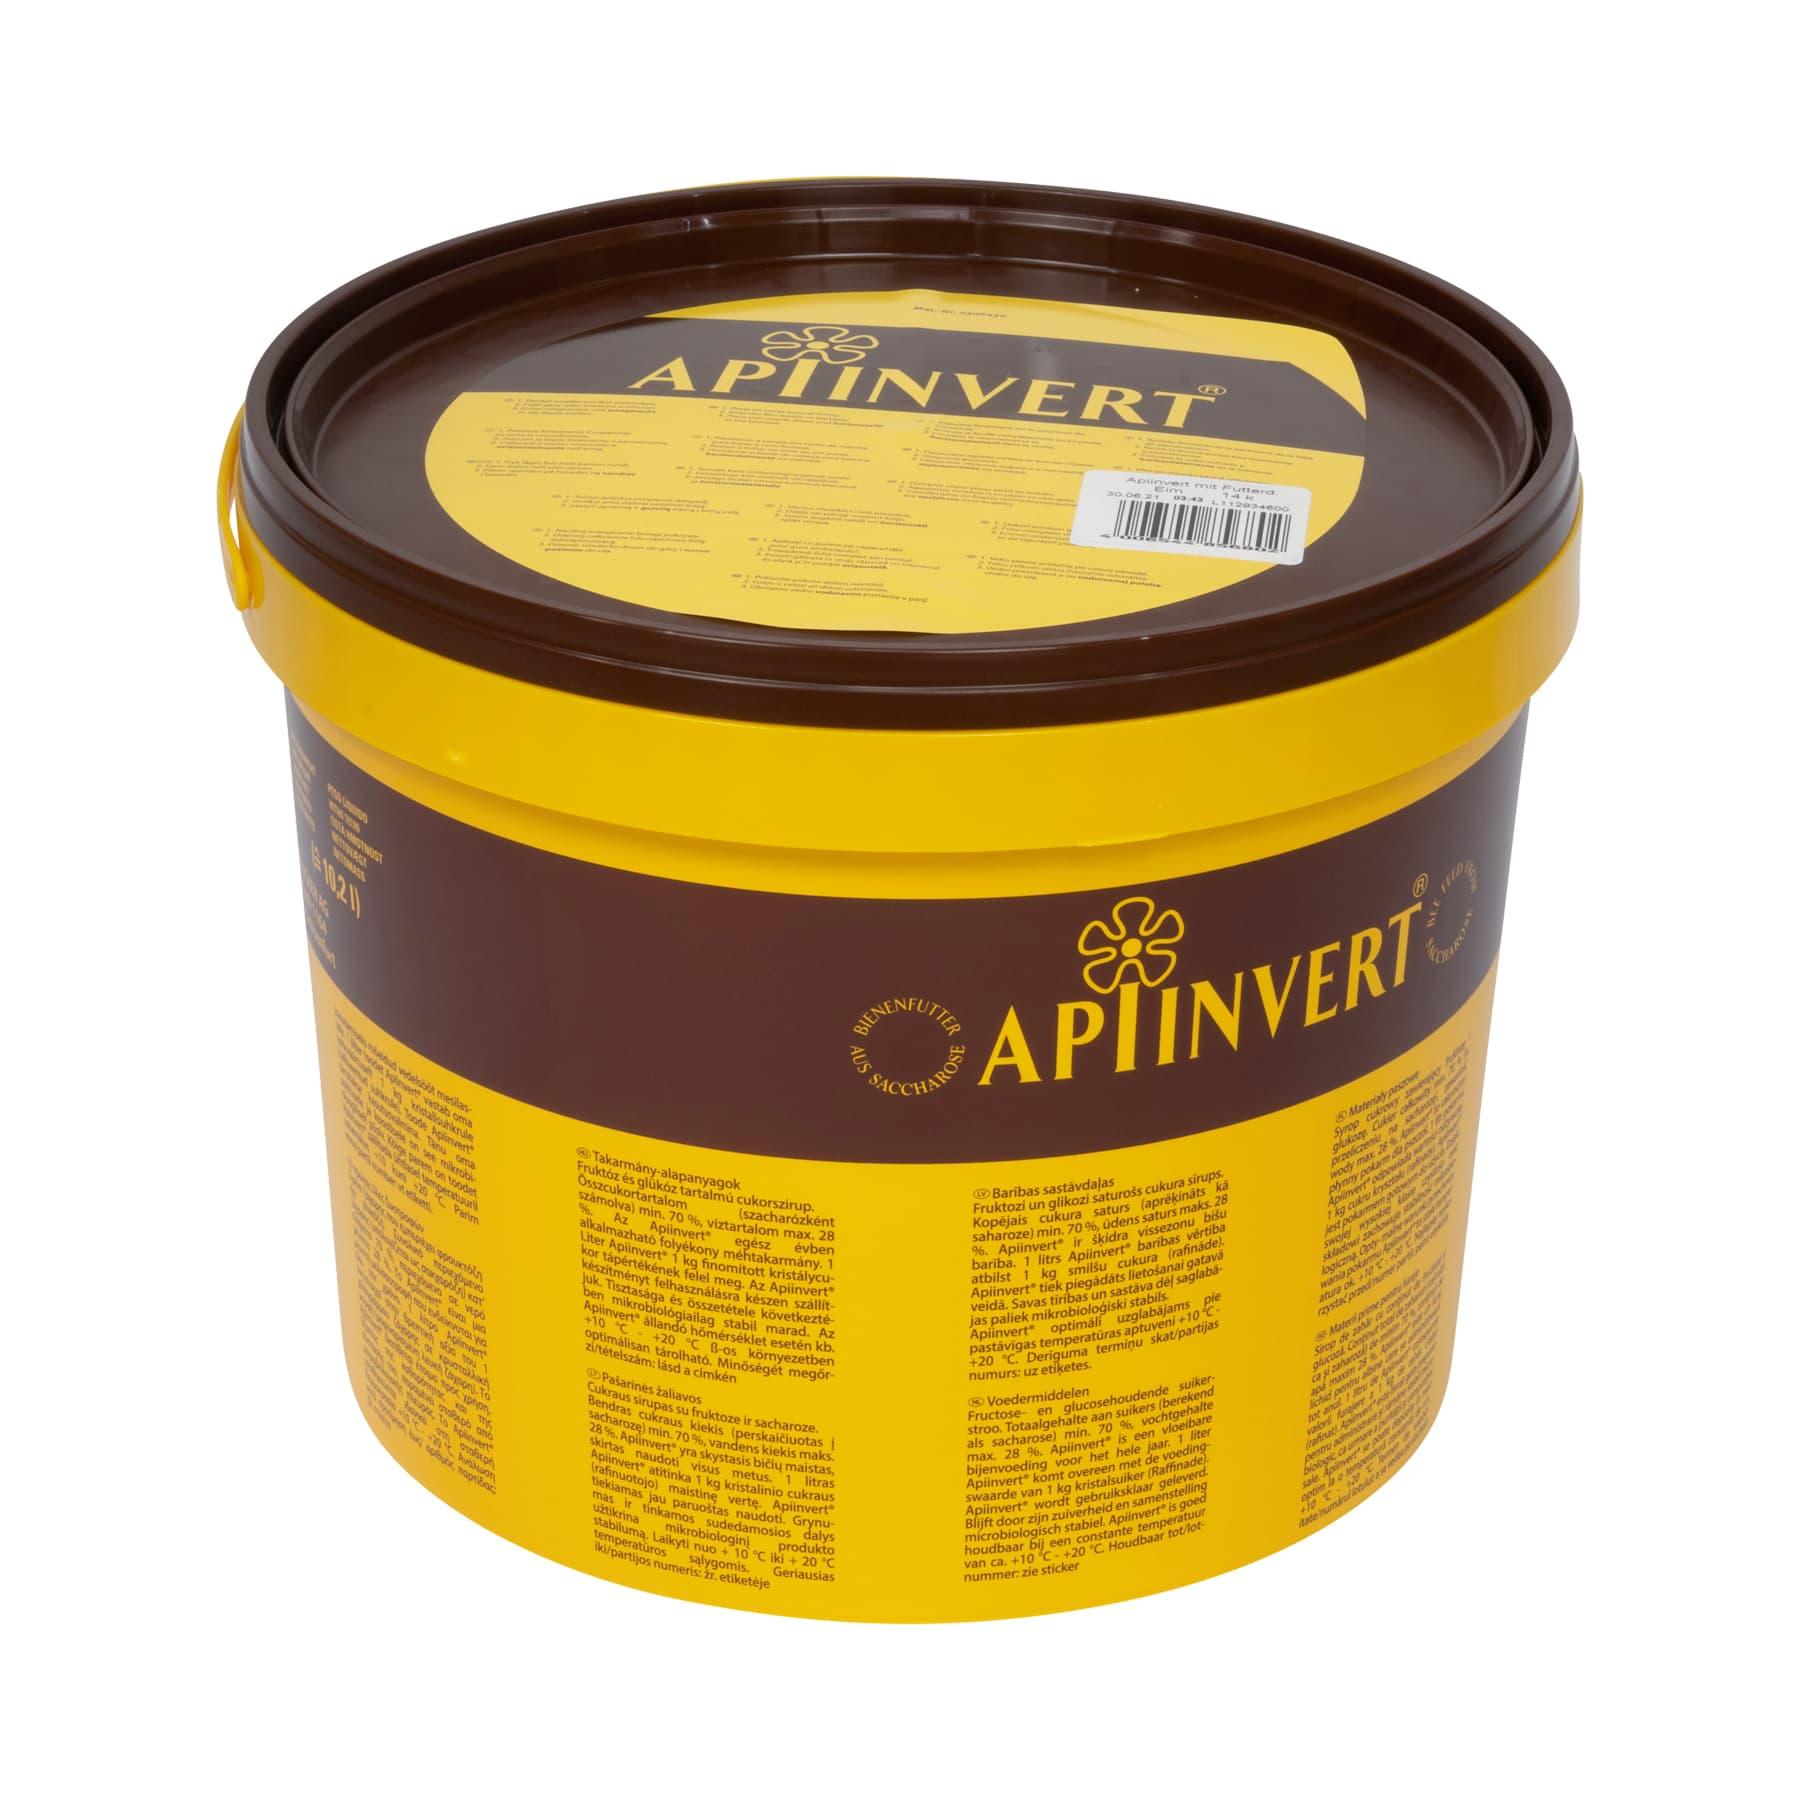 Apiinvert Sirup 14 kg Eimer,